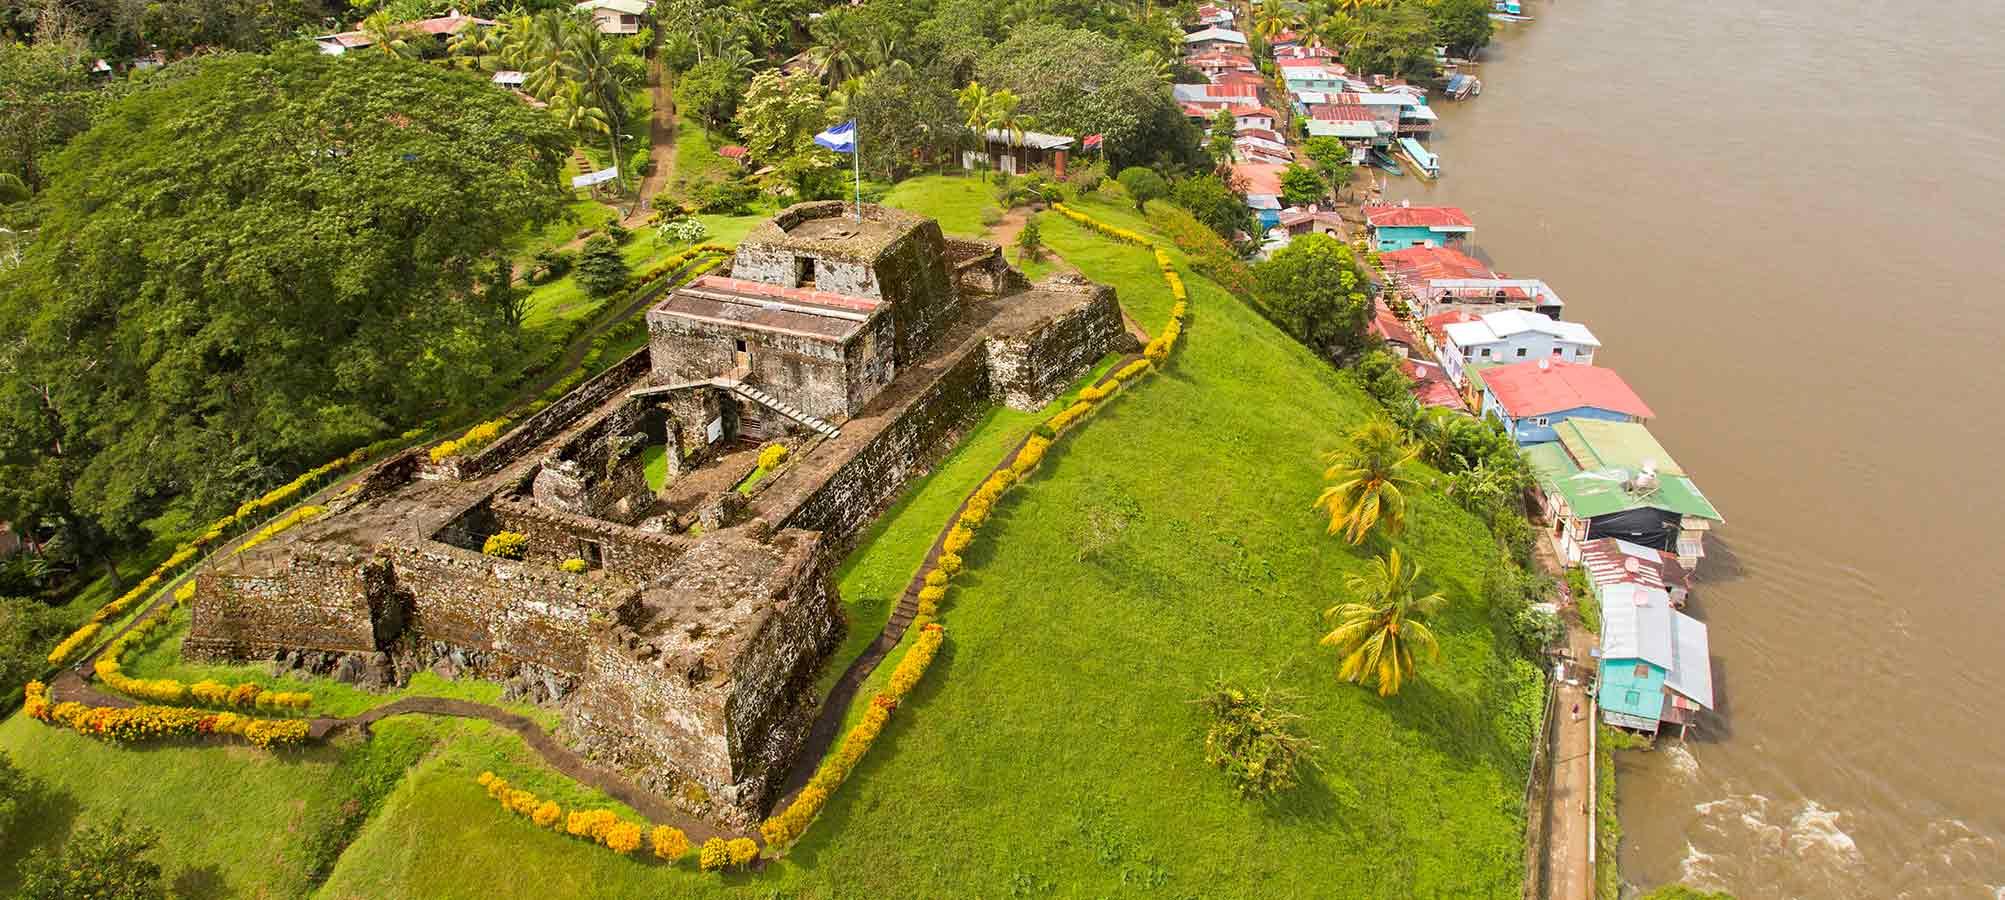 Vista aérea de El Castillo